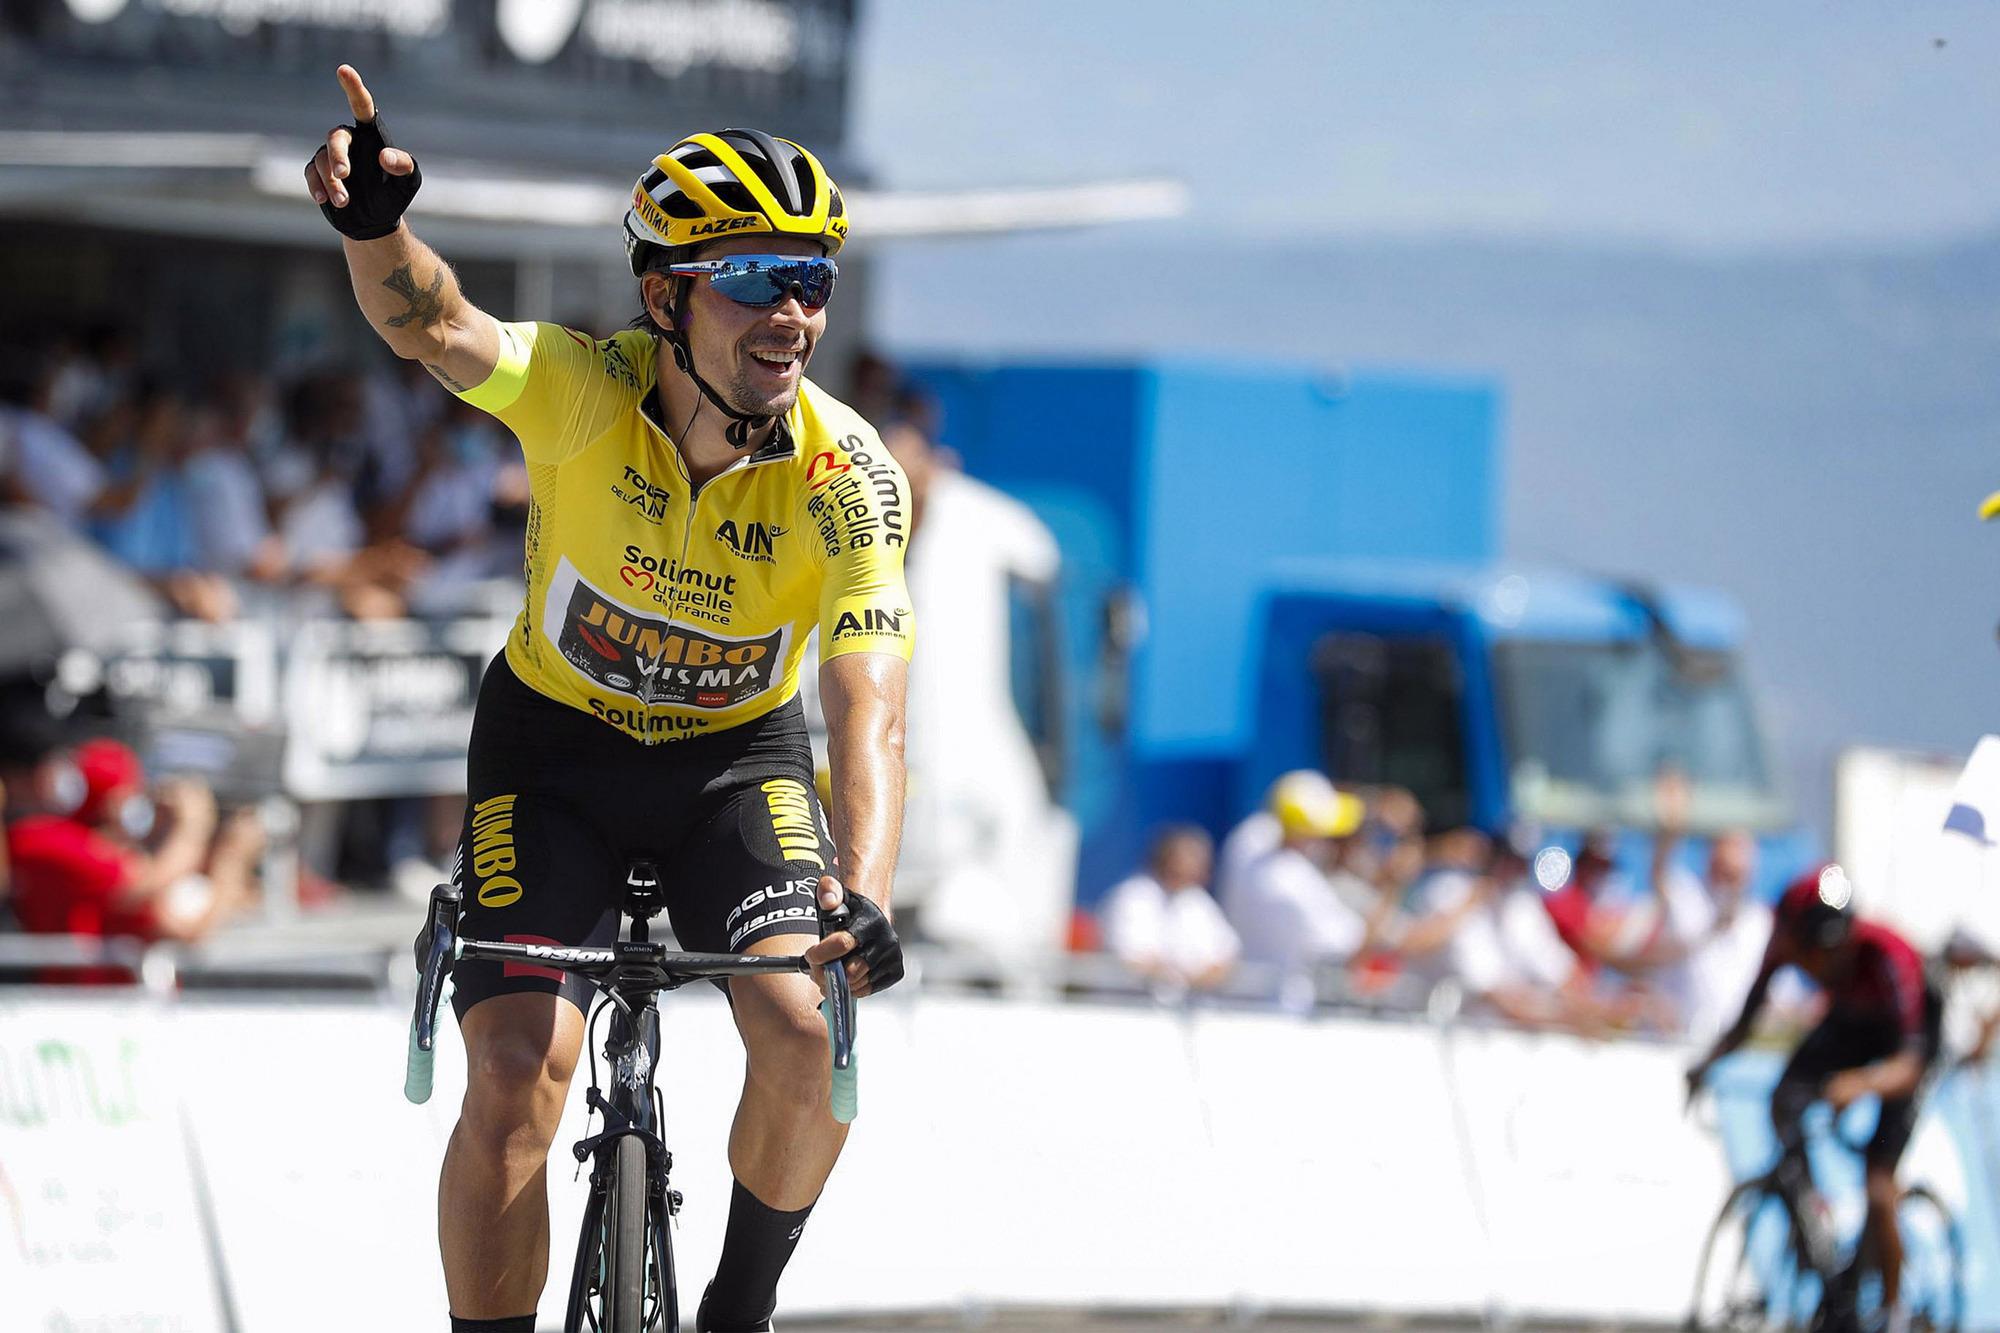 Criterium Du Dauphine Primoz Roglic Wins Stage 2 Atop Col De Porte Cyclingnews